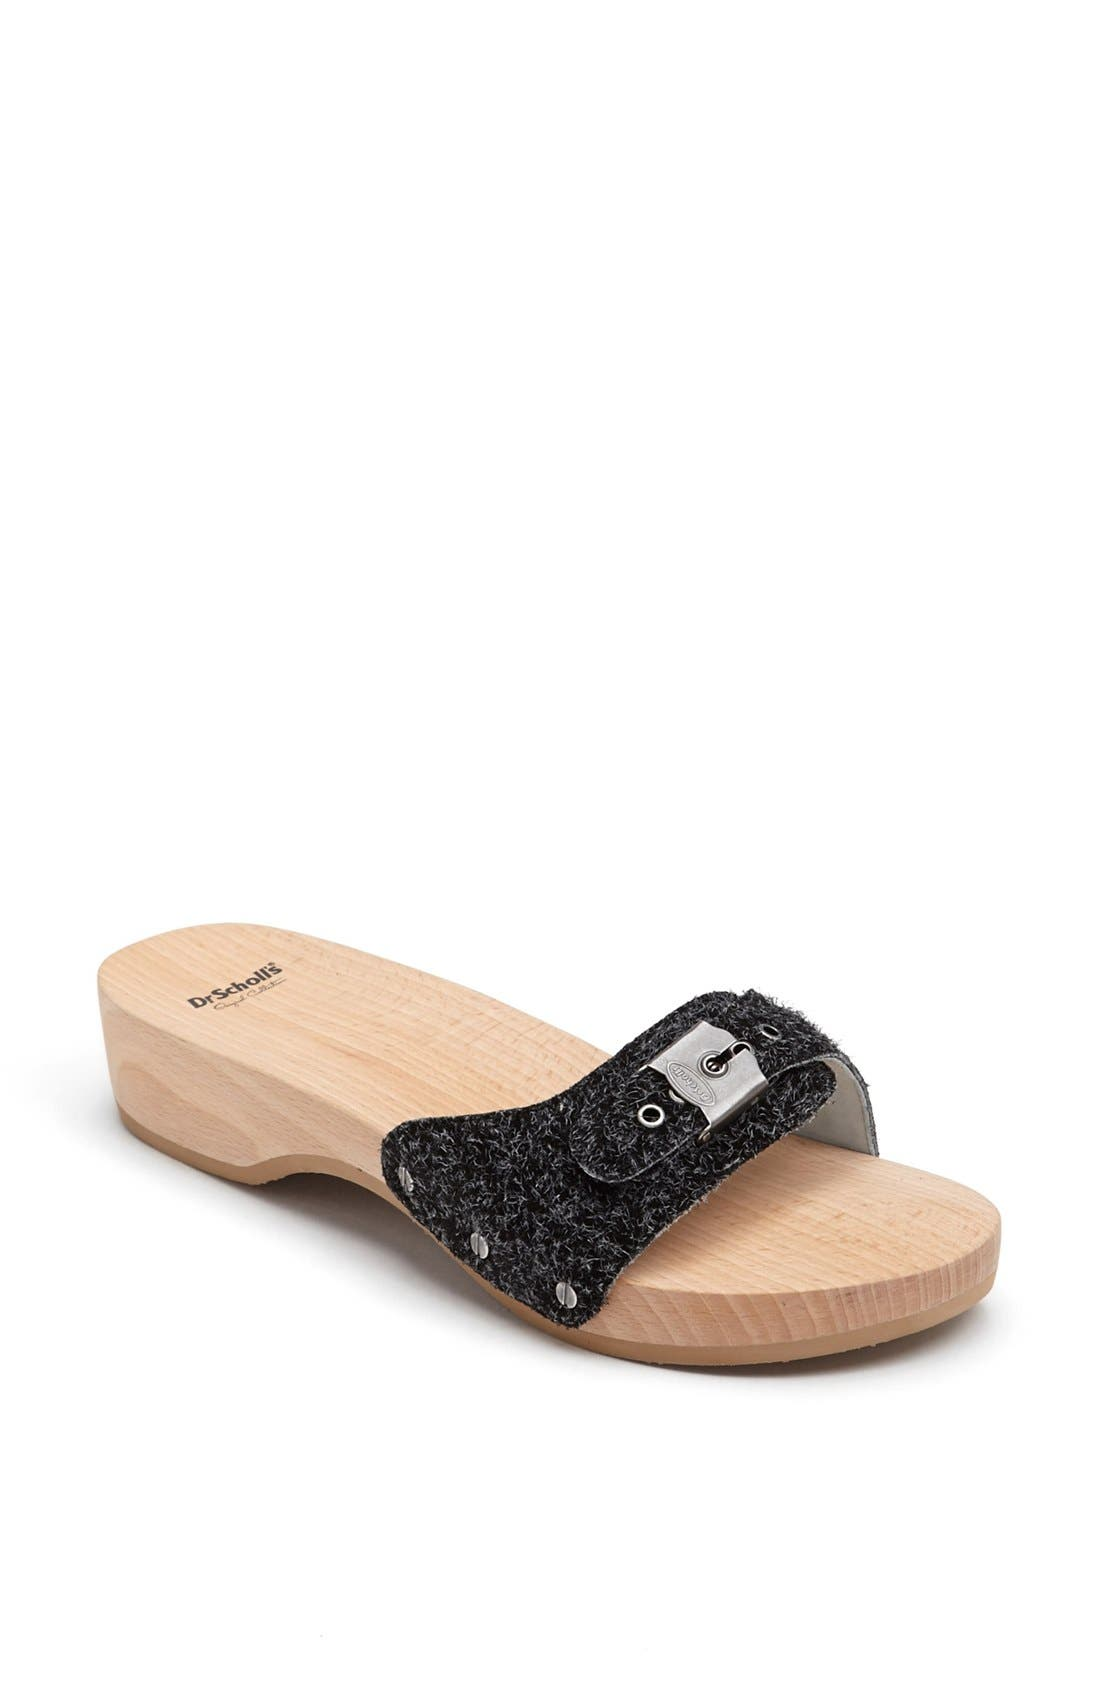 Alternate Image 1 Selected - Dr. Scholl's 'Original' Sandal